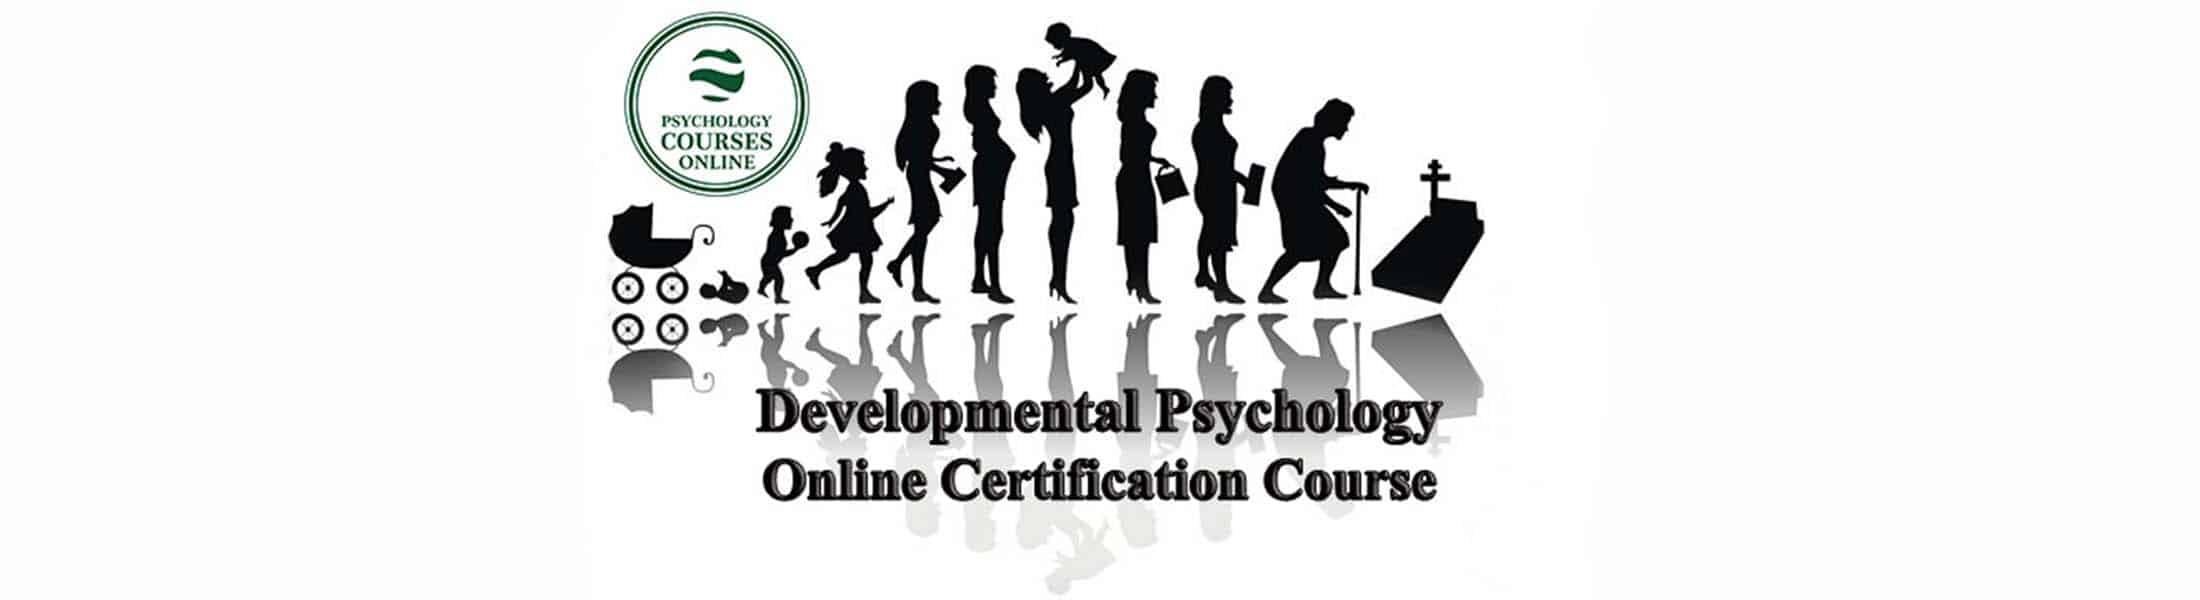 Developmental Psychology Online Certification Course